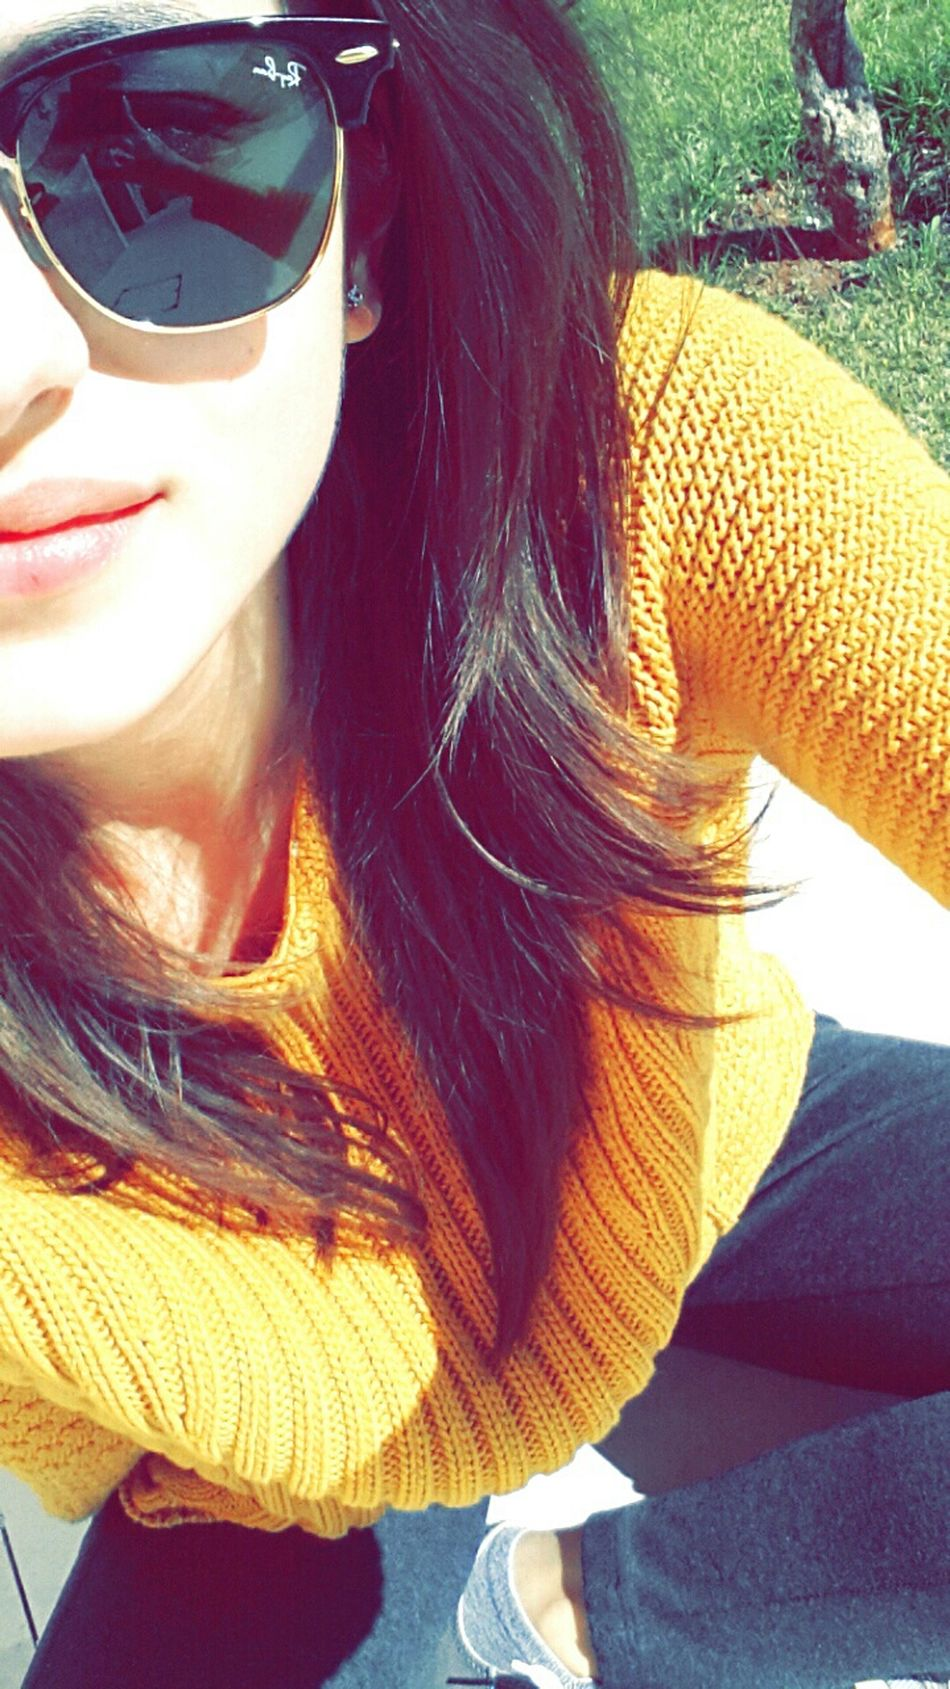 Playing matchy-matchy with the sun☀ Yellowfever HeyMrSun Selfie Everydaylife SmallJoys Colorful Today's Hot Look Weatherreport Candidphotography EyeEmbestshots